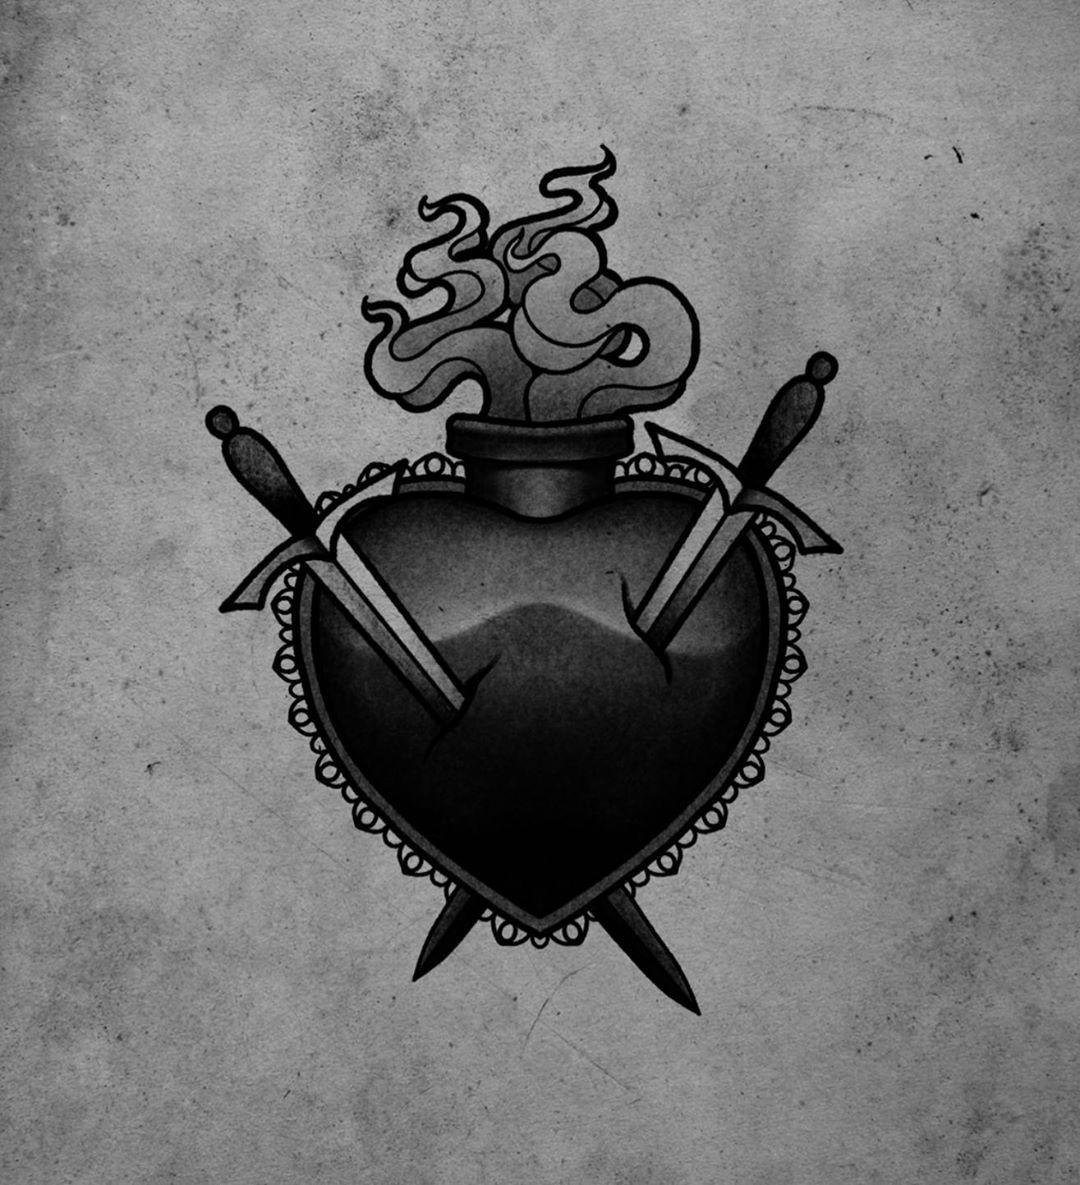 Aga Kasprowicz inksearch tattoo